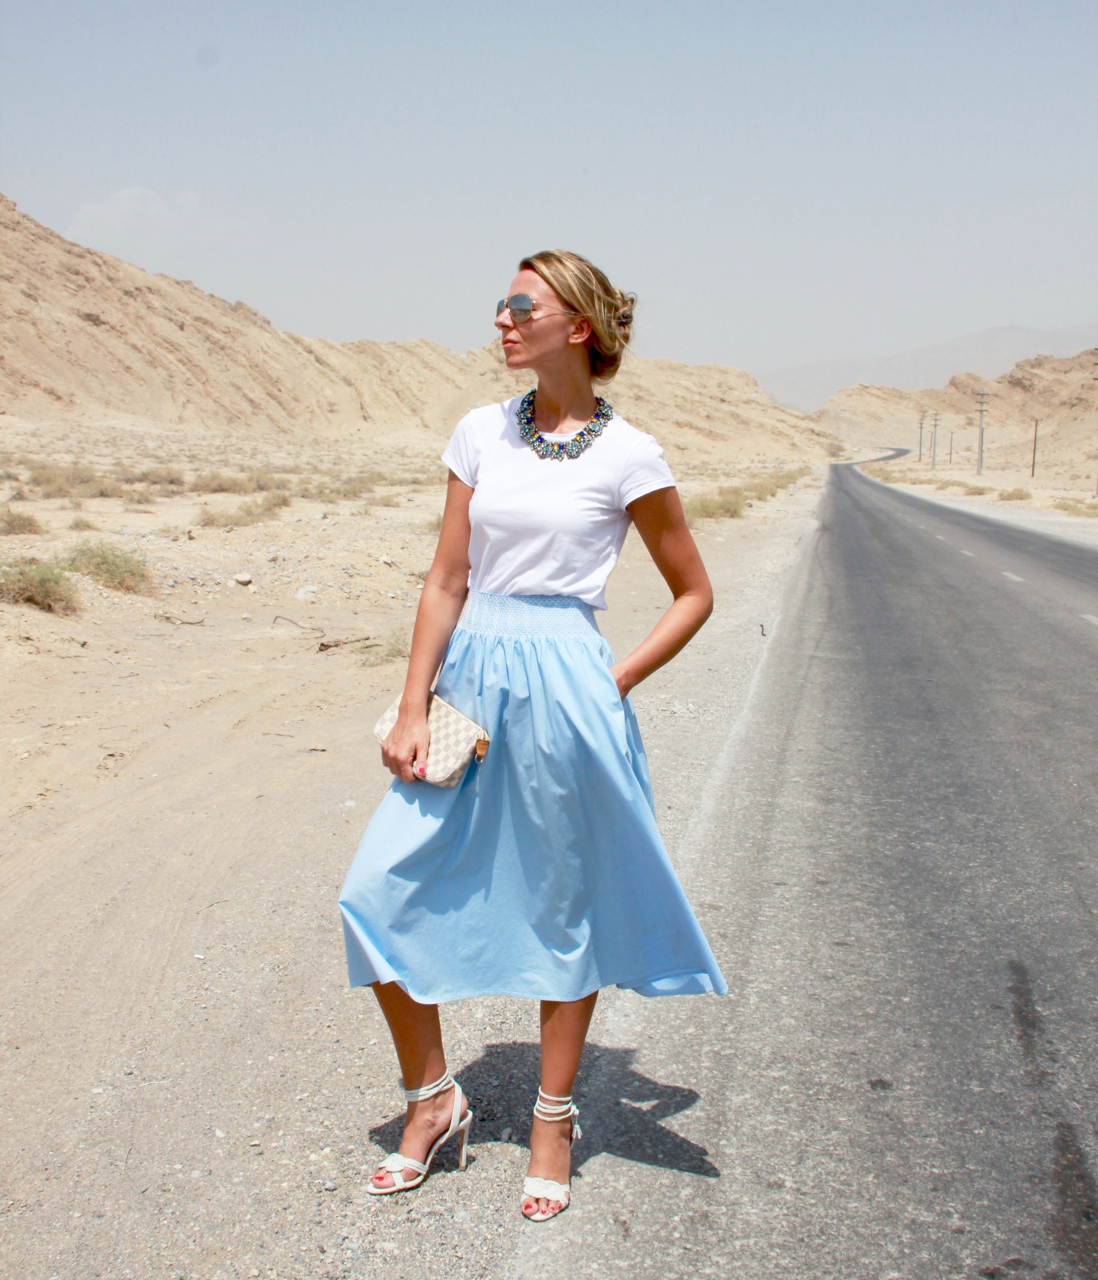 HELLBLAUER MIDI ROCK IN DEN JEBEL JAIS MOUNTAINS Rock Fashion Mode Lifestyle HappinesBoutique Zara Asos LouisVuitton LV Pochette LV Jennifer PepperAndGold Outfit